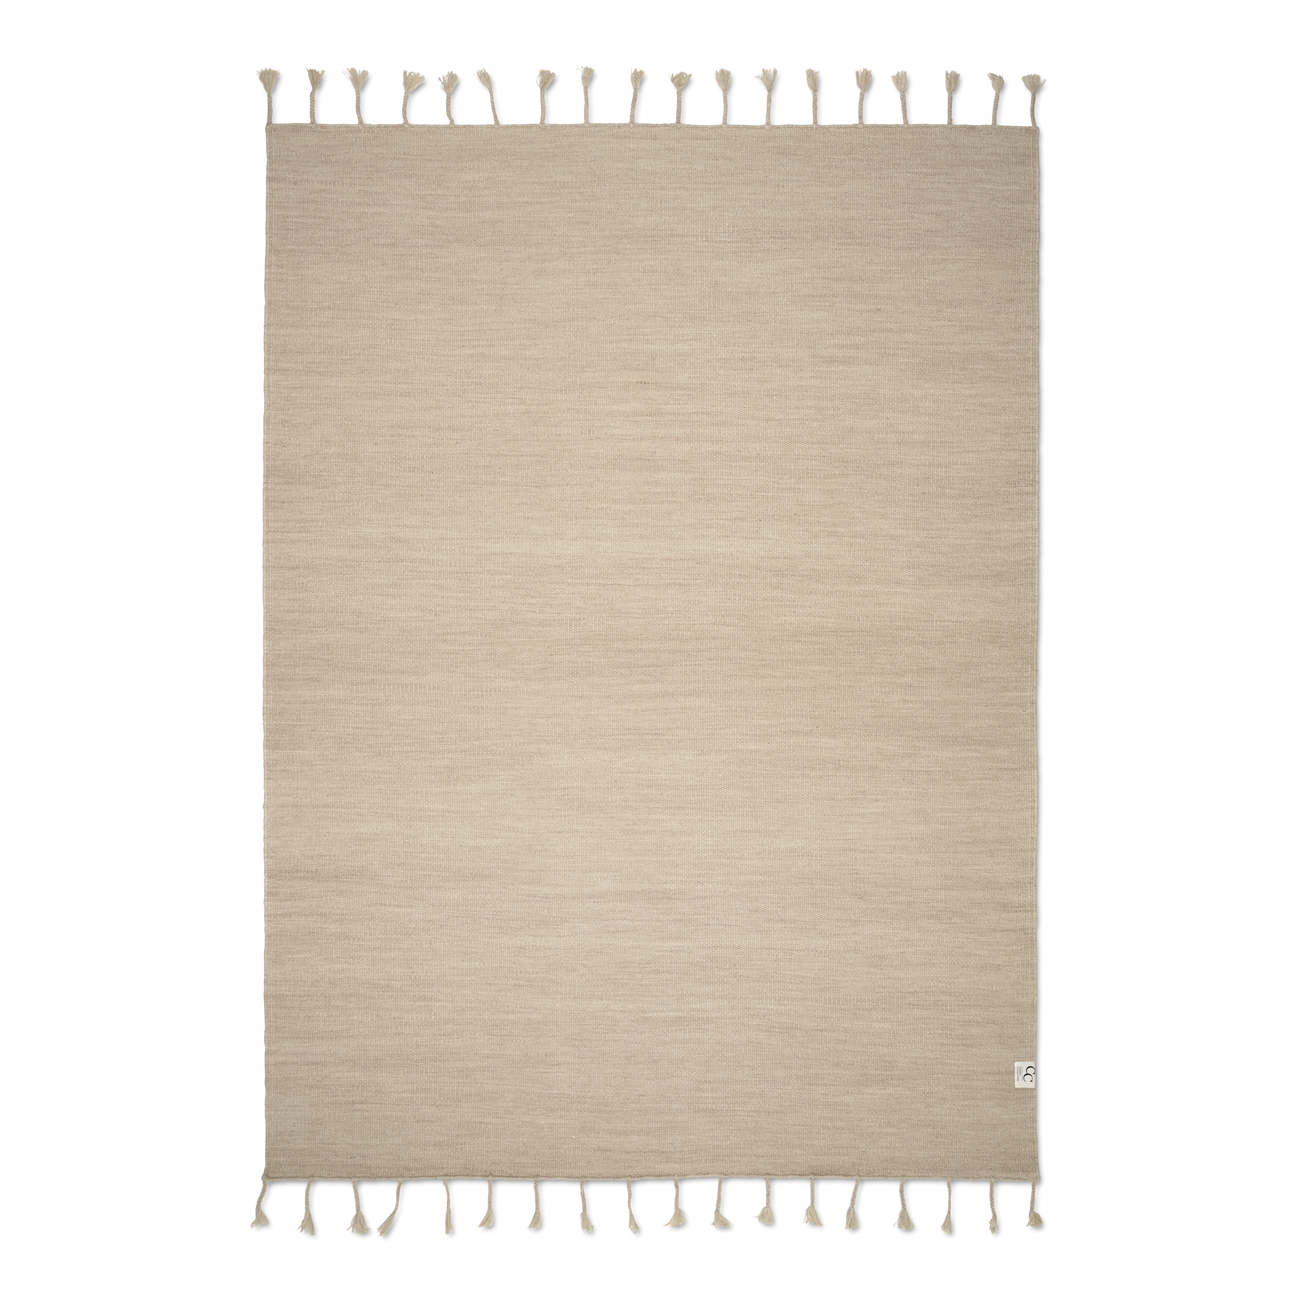 Ullmatta PLAIN SAND 200x300, Classic Collection